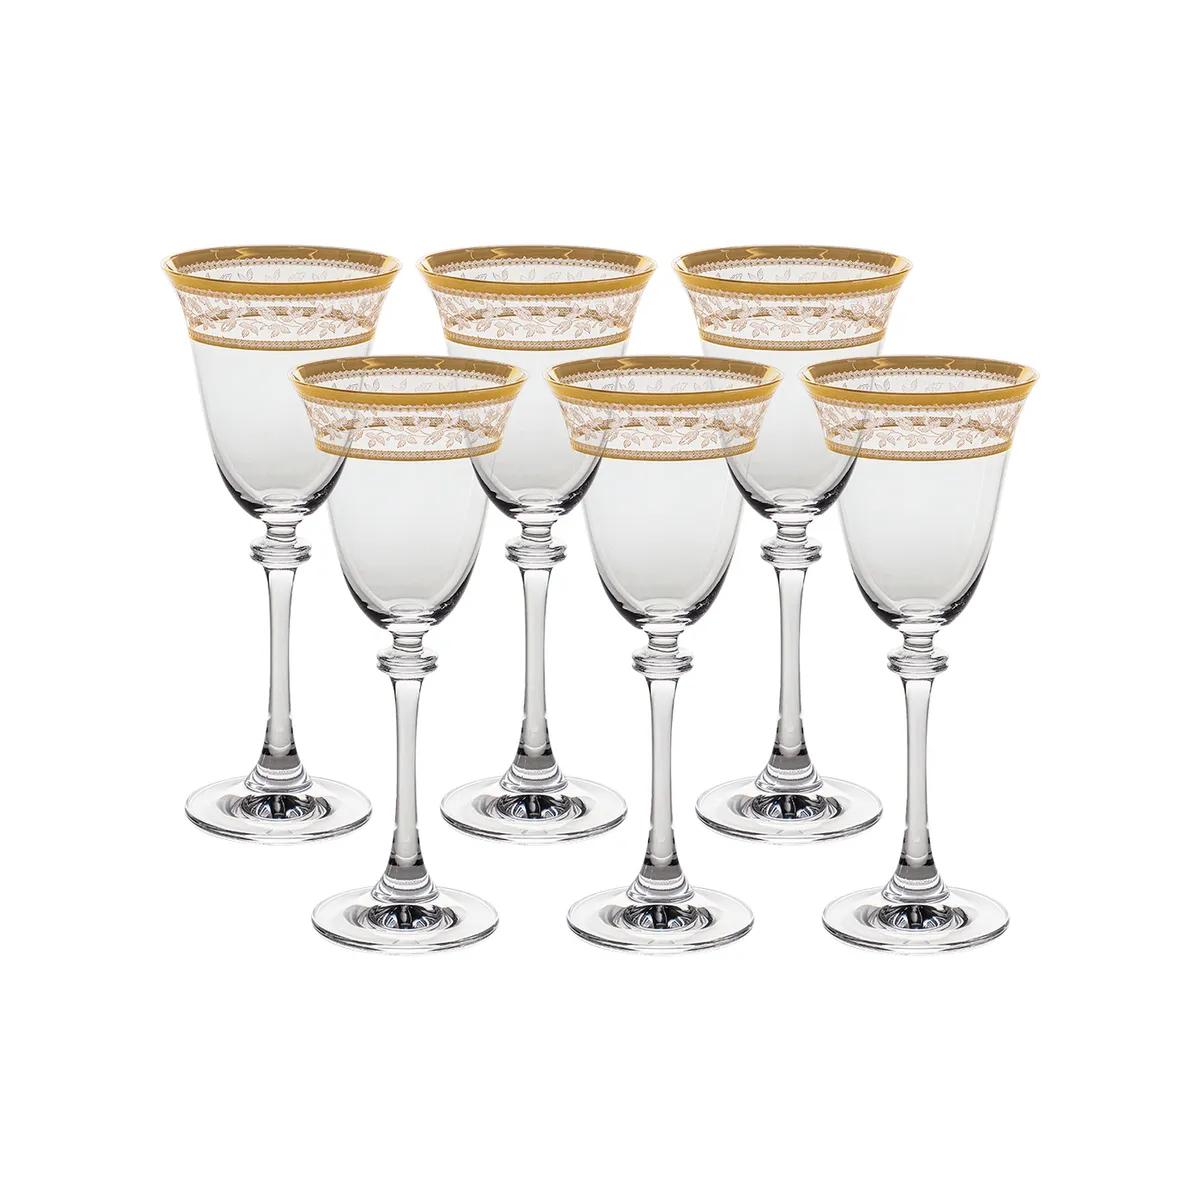 Фото - Набор бокалов для белого вина Crystalite Bohemia Asio Панто золото 185 мл 6 шт набор фужеров crystalite bohemia asio панто платина 190 мл 6 шт